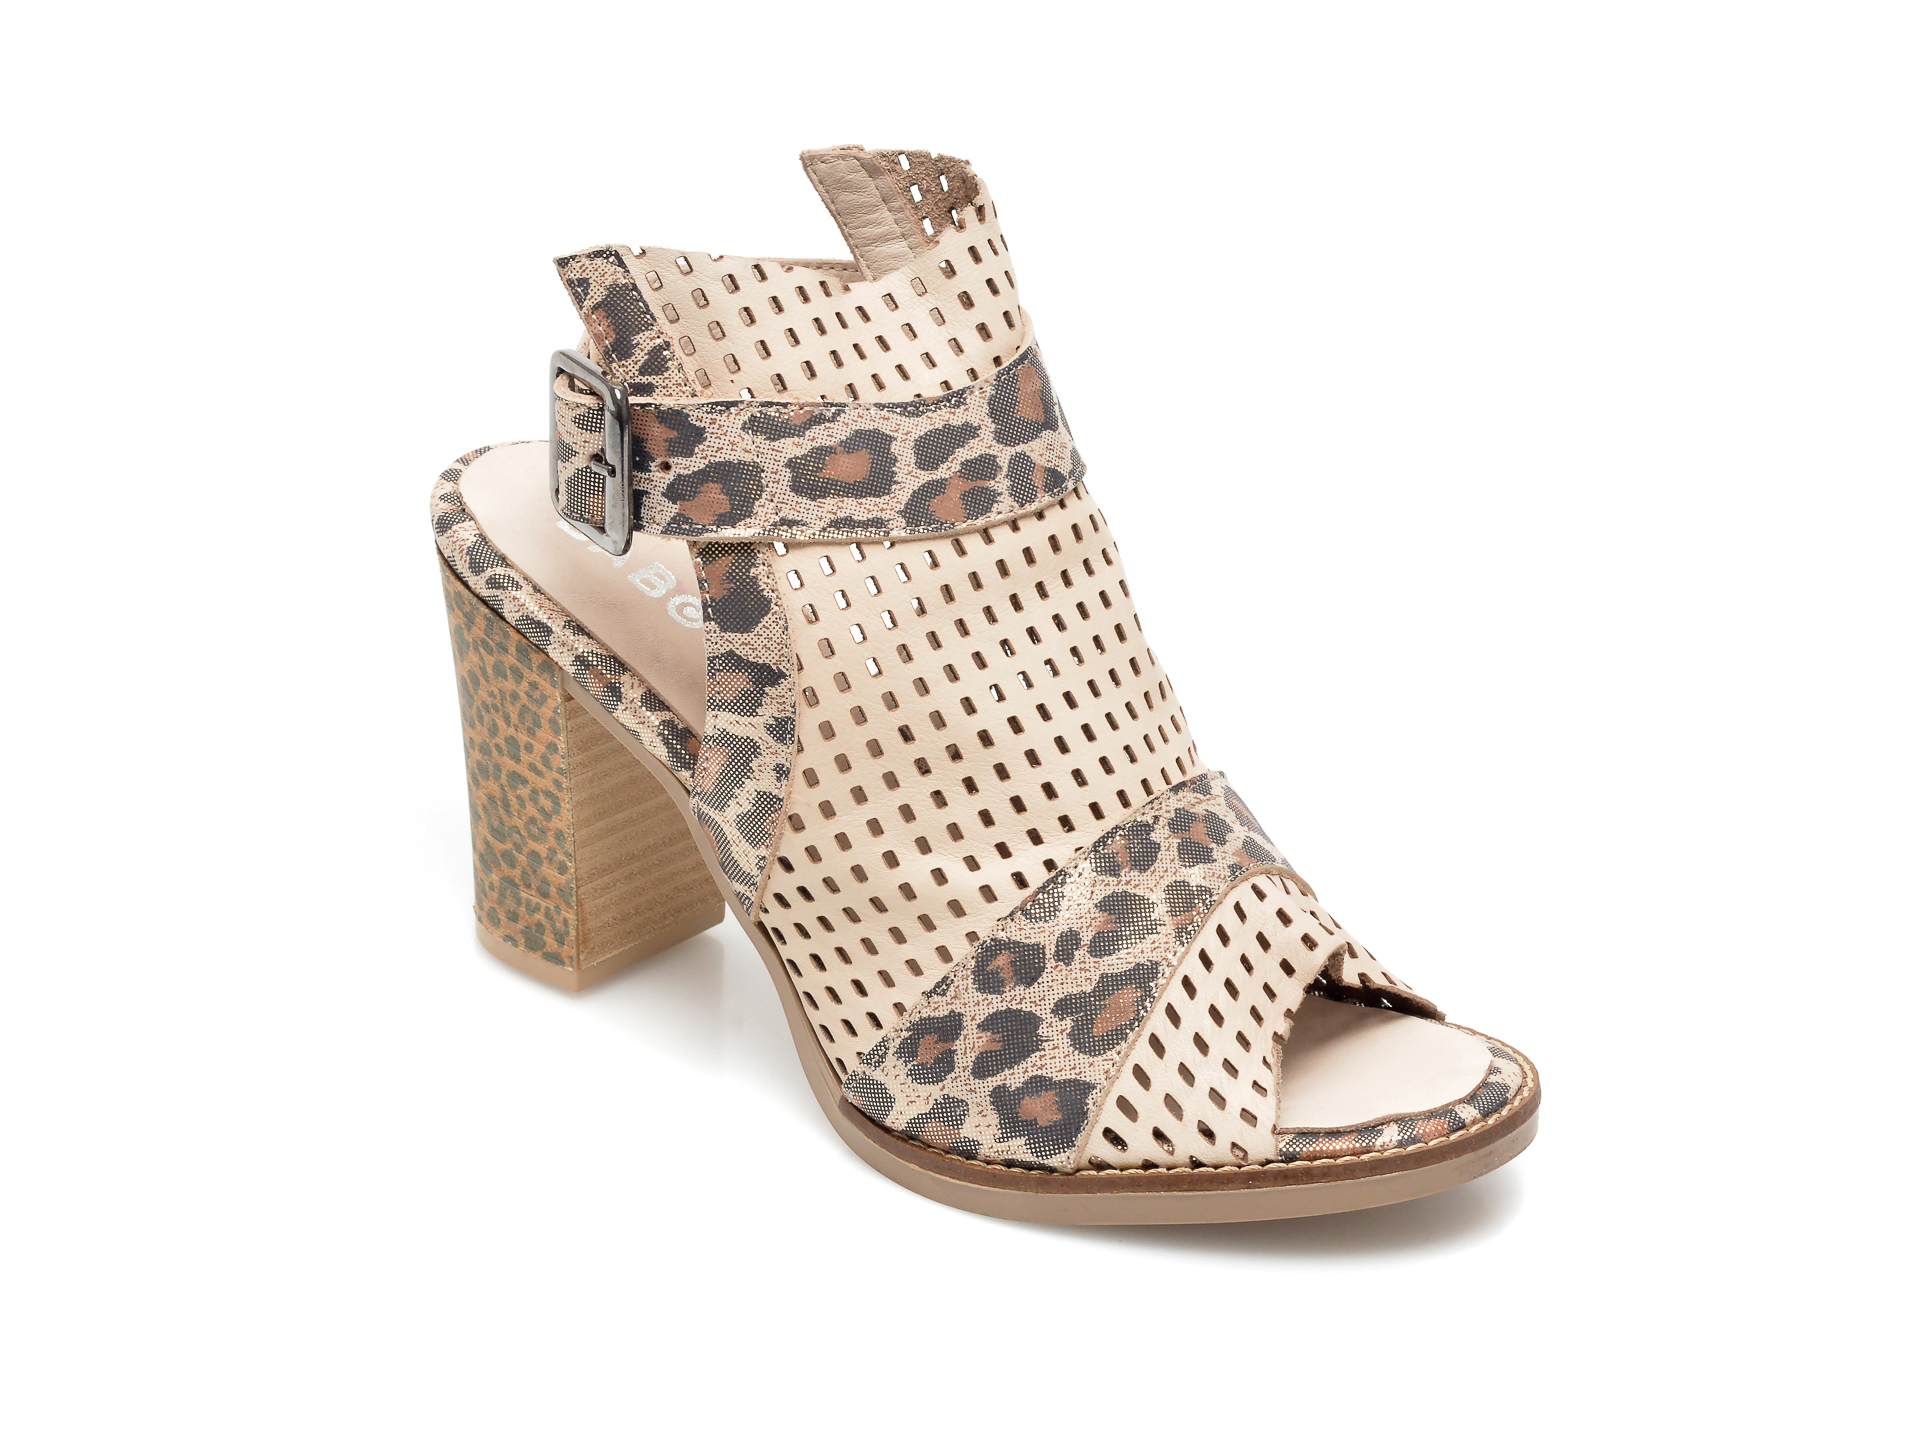 Sandale BABOOS bej, 1601, din piele naturala imagine otter.ro 2021